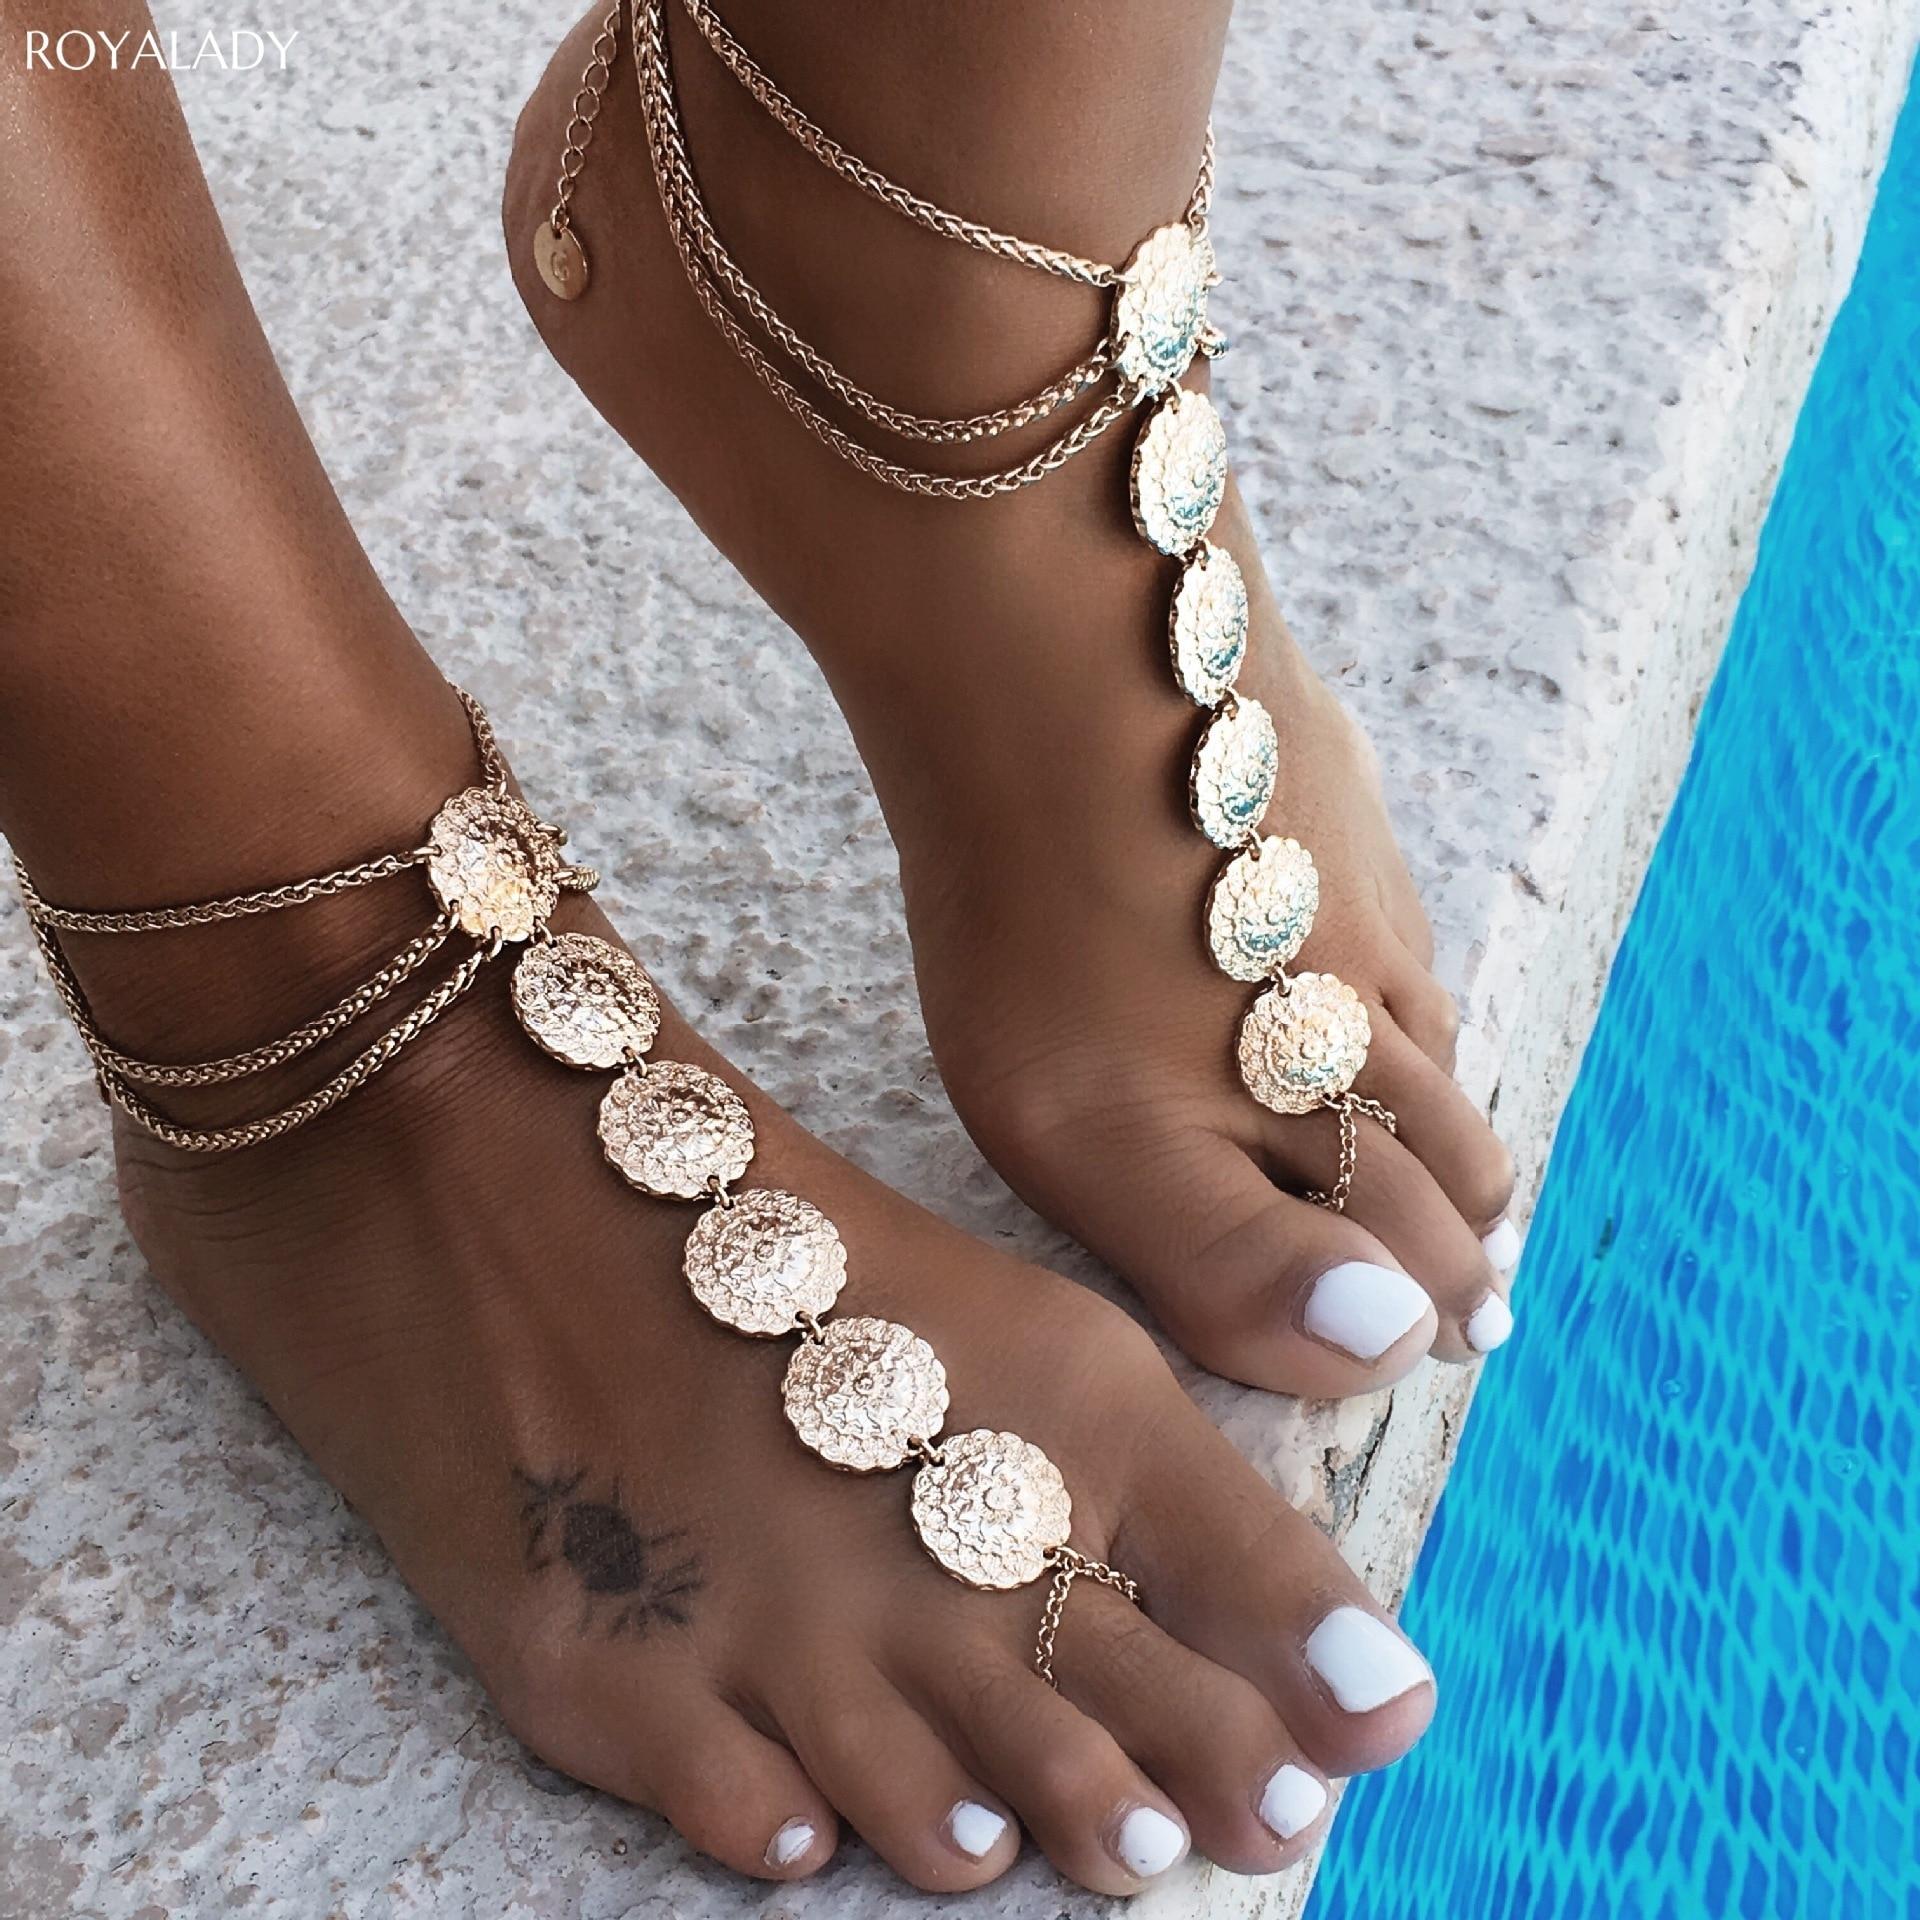 Vintage Carving Flower Coins Anklets For Women Bohemian Handmade Summer Beach Pendant Ankle Bracelet For Women Foot Jewelry Gift